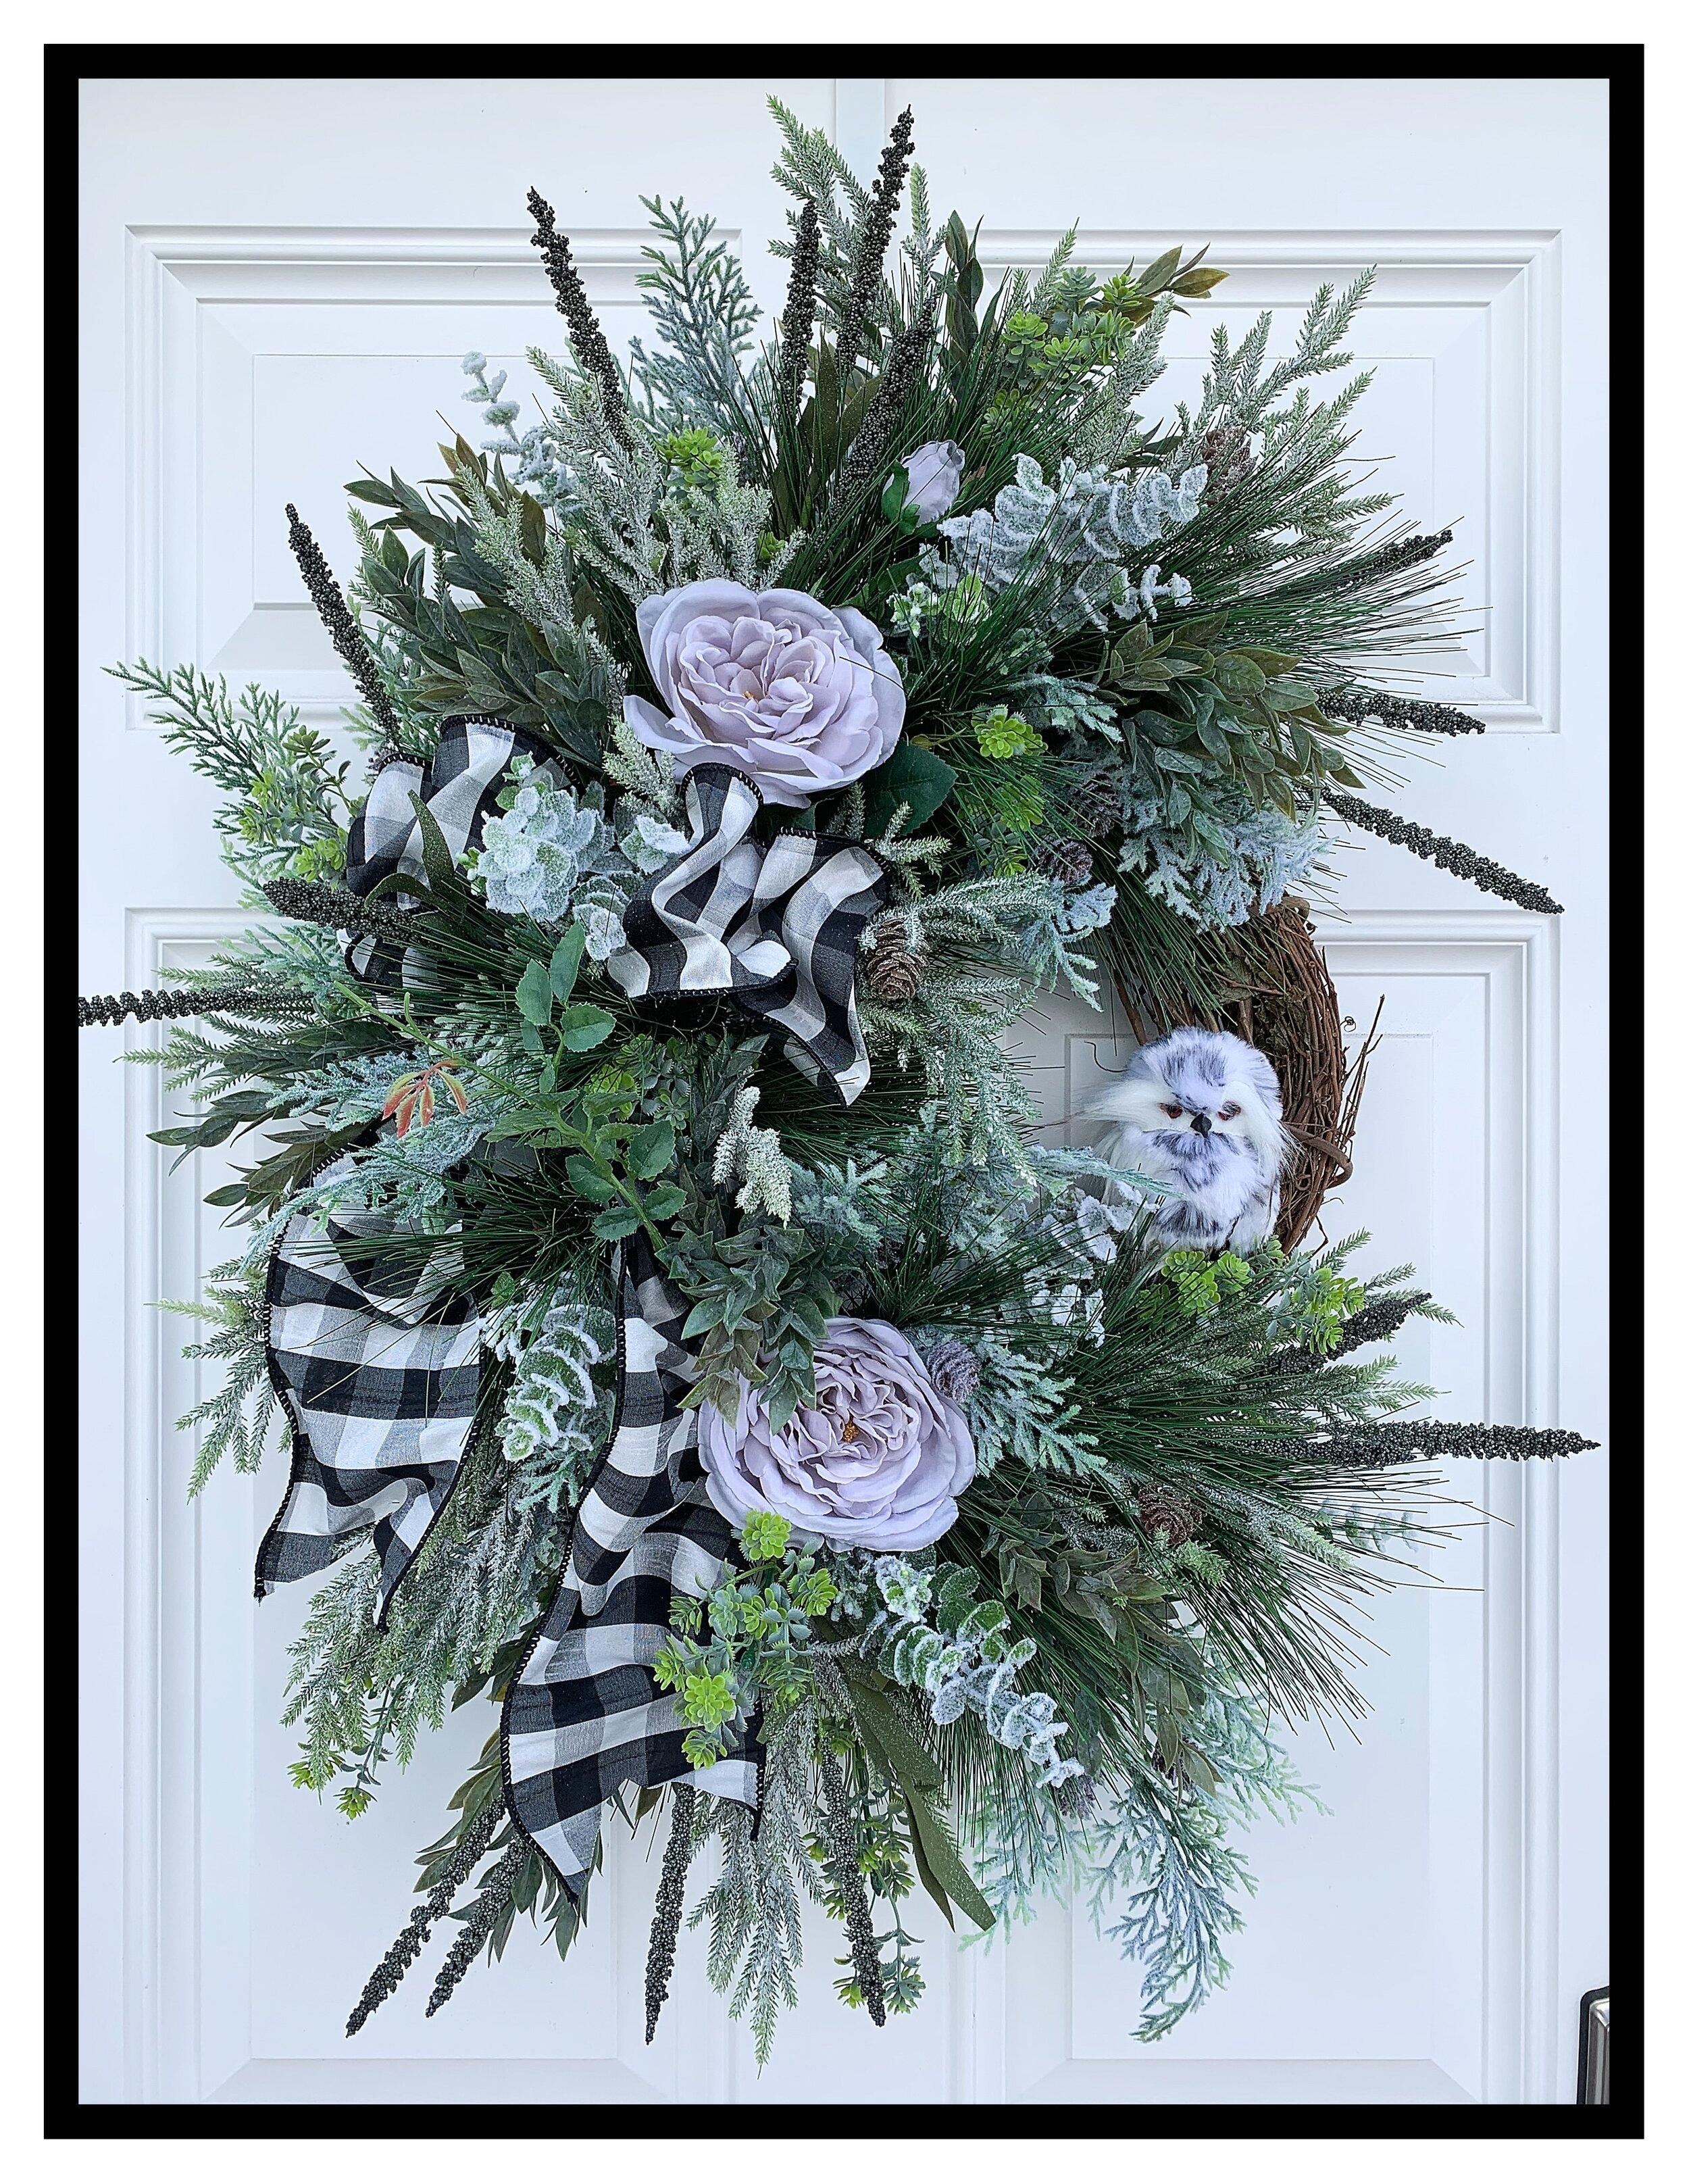 Christmas Door Swags Elegant Christmas Wreaths Holiday Decorations Front Door Sugar Creek Home Decor